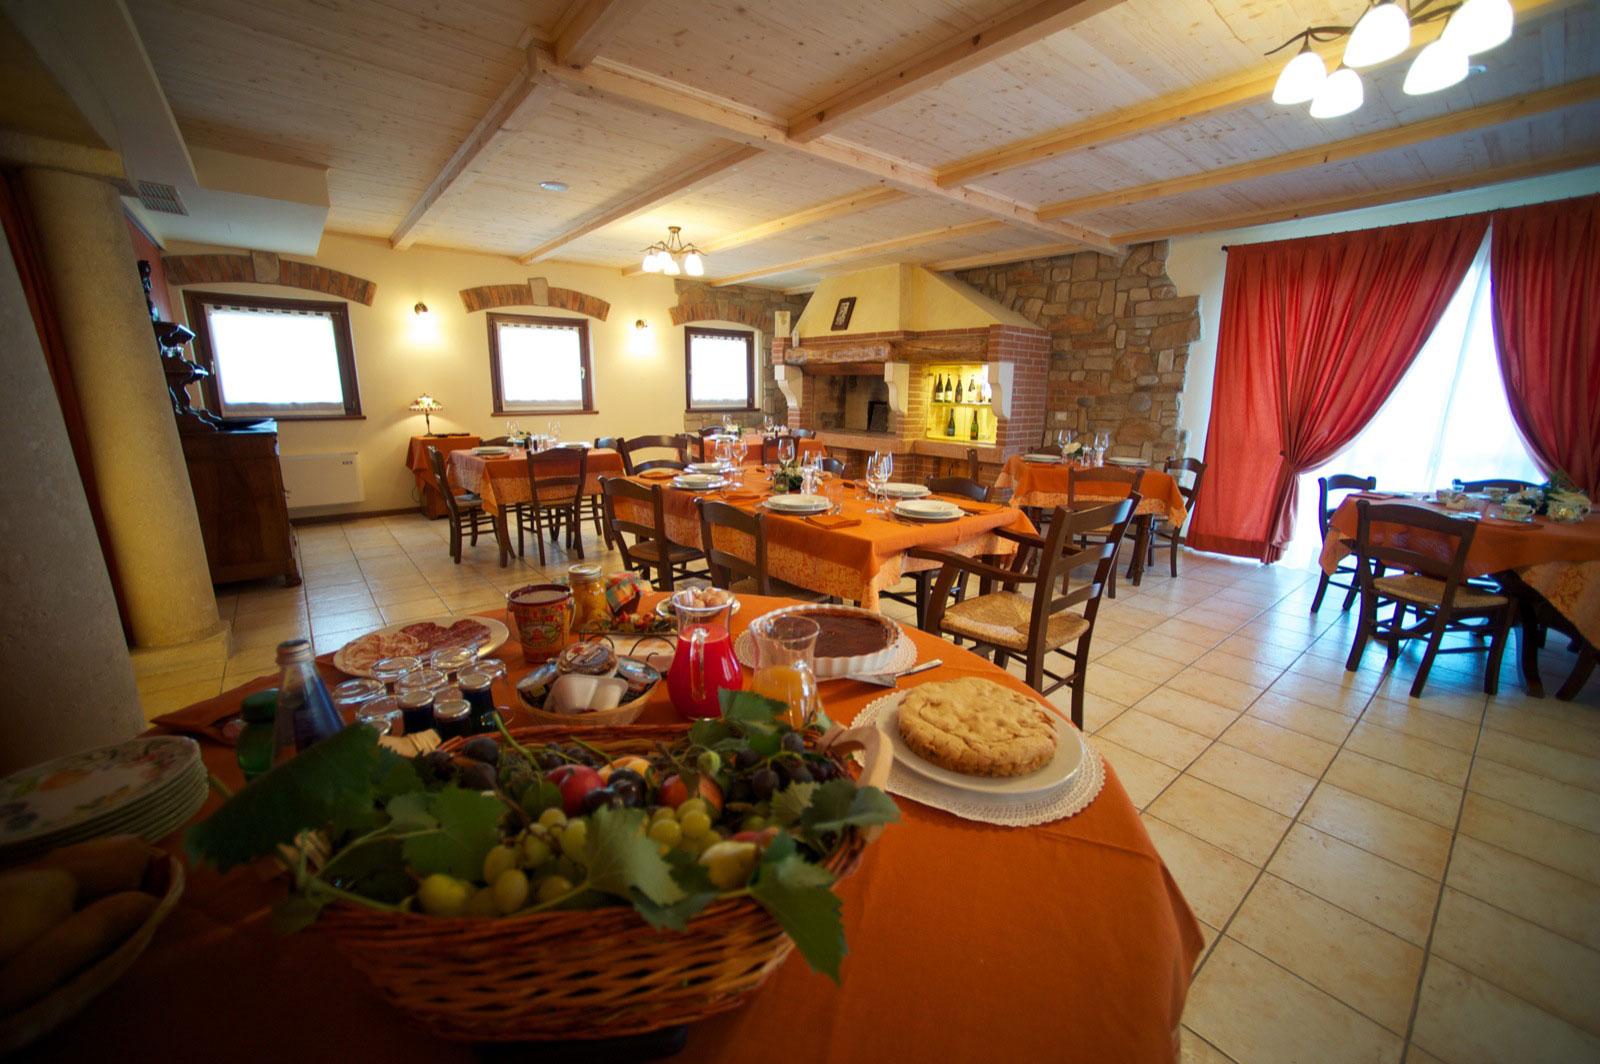 ristorante-i-caloseni-sala1543b60d0043ed.jpg